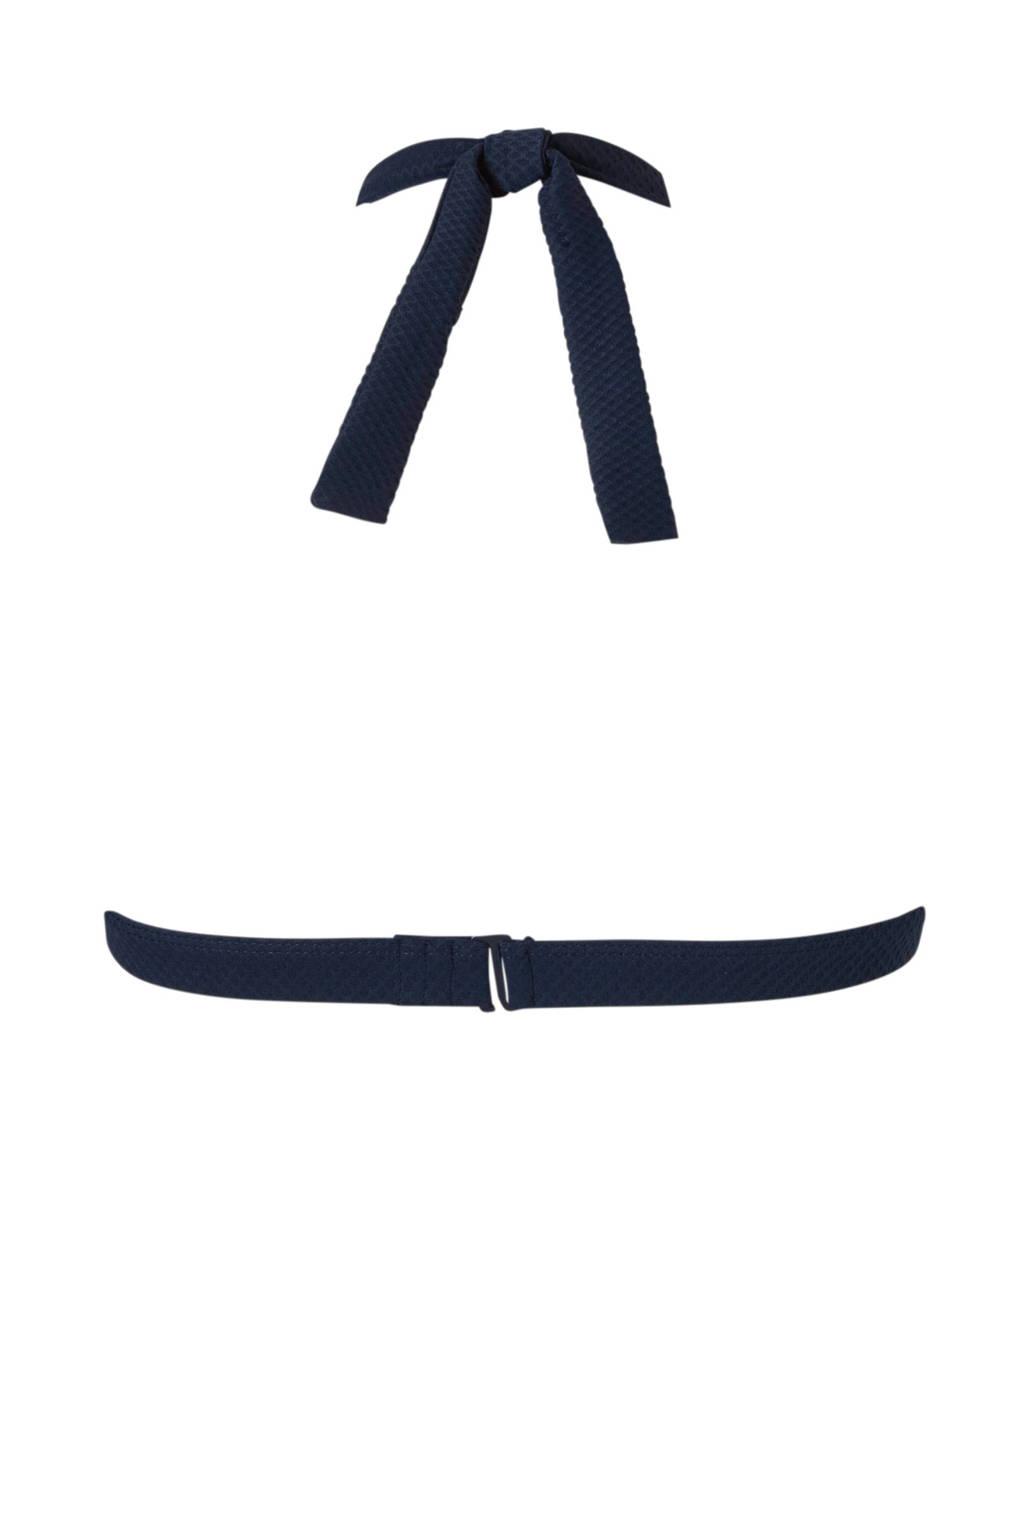 Bikinitop Met Australiahalter Baku Blauw Textuur A8F4qw5